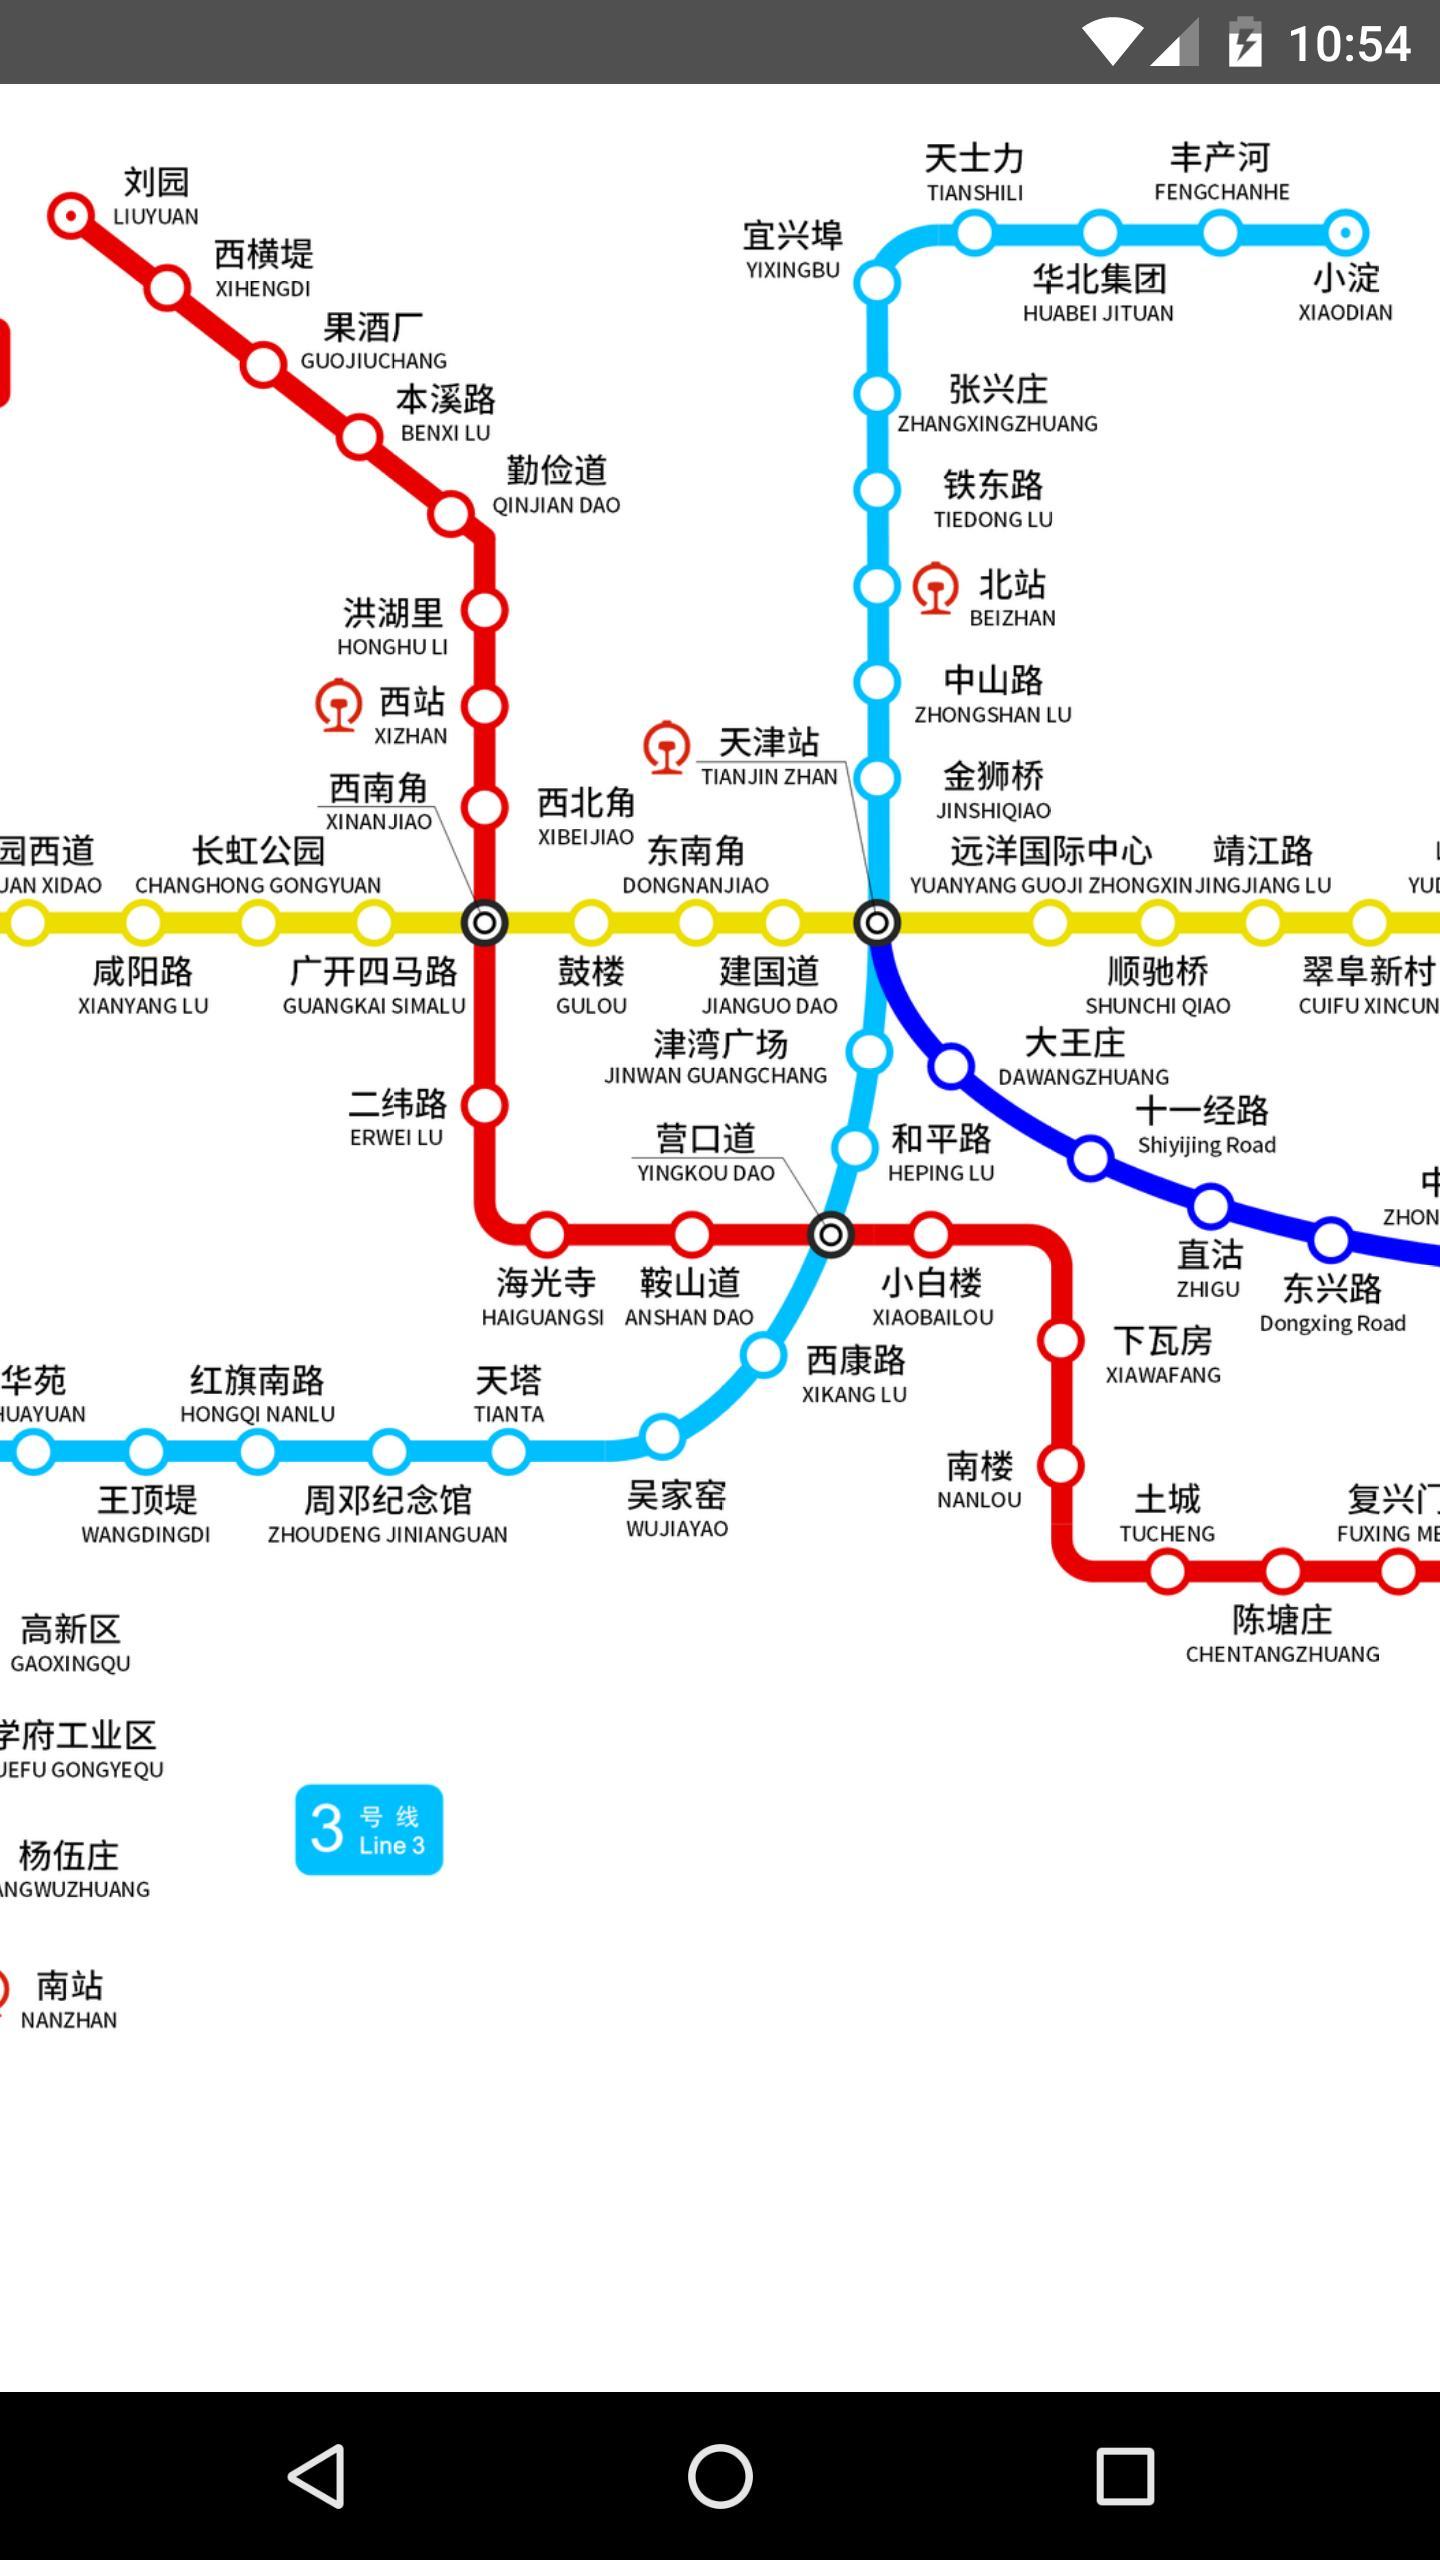 Tianjin Subway Map.Tianjin Metro Map 2017 For Android Apk Download